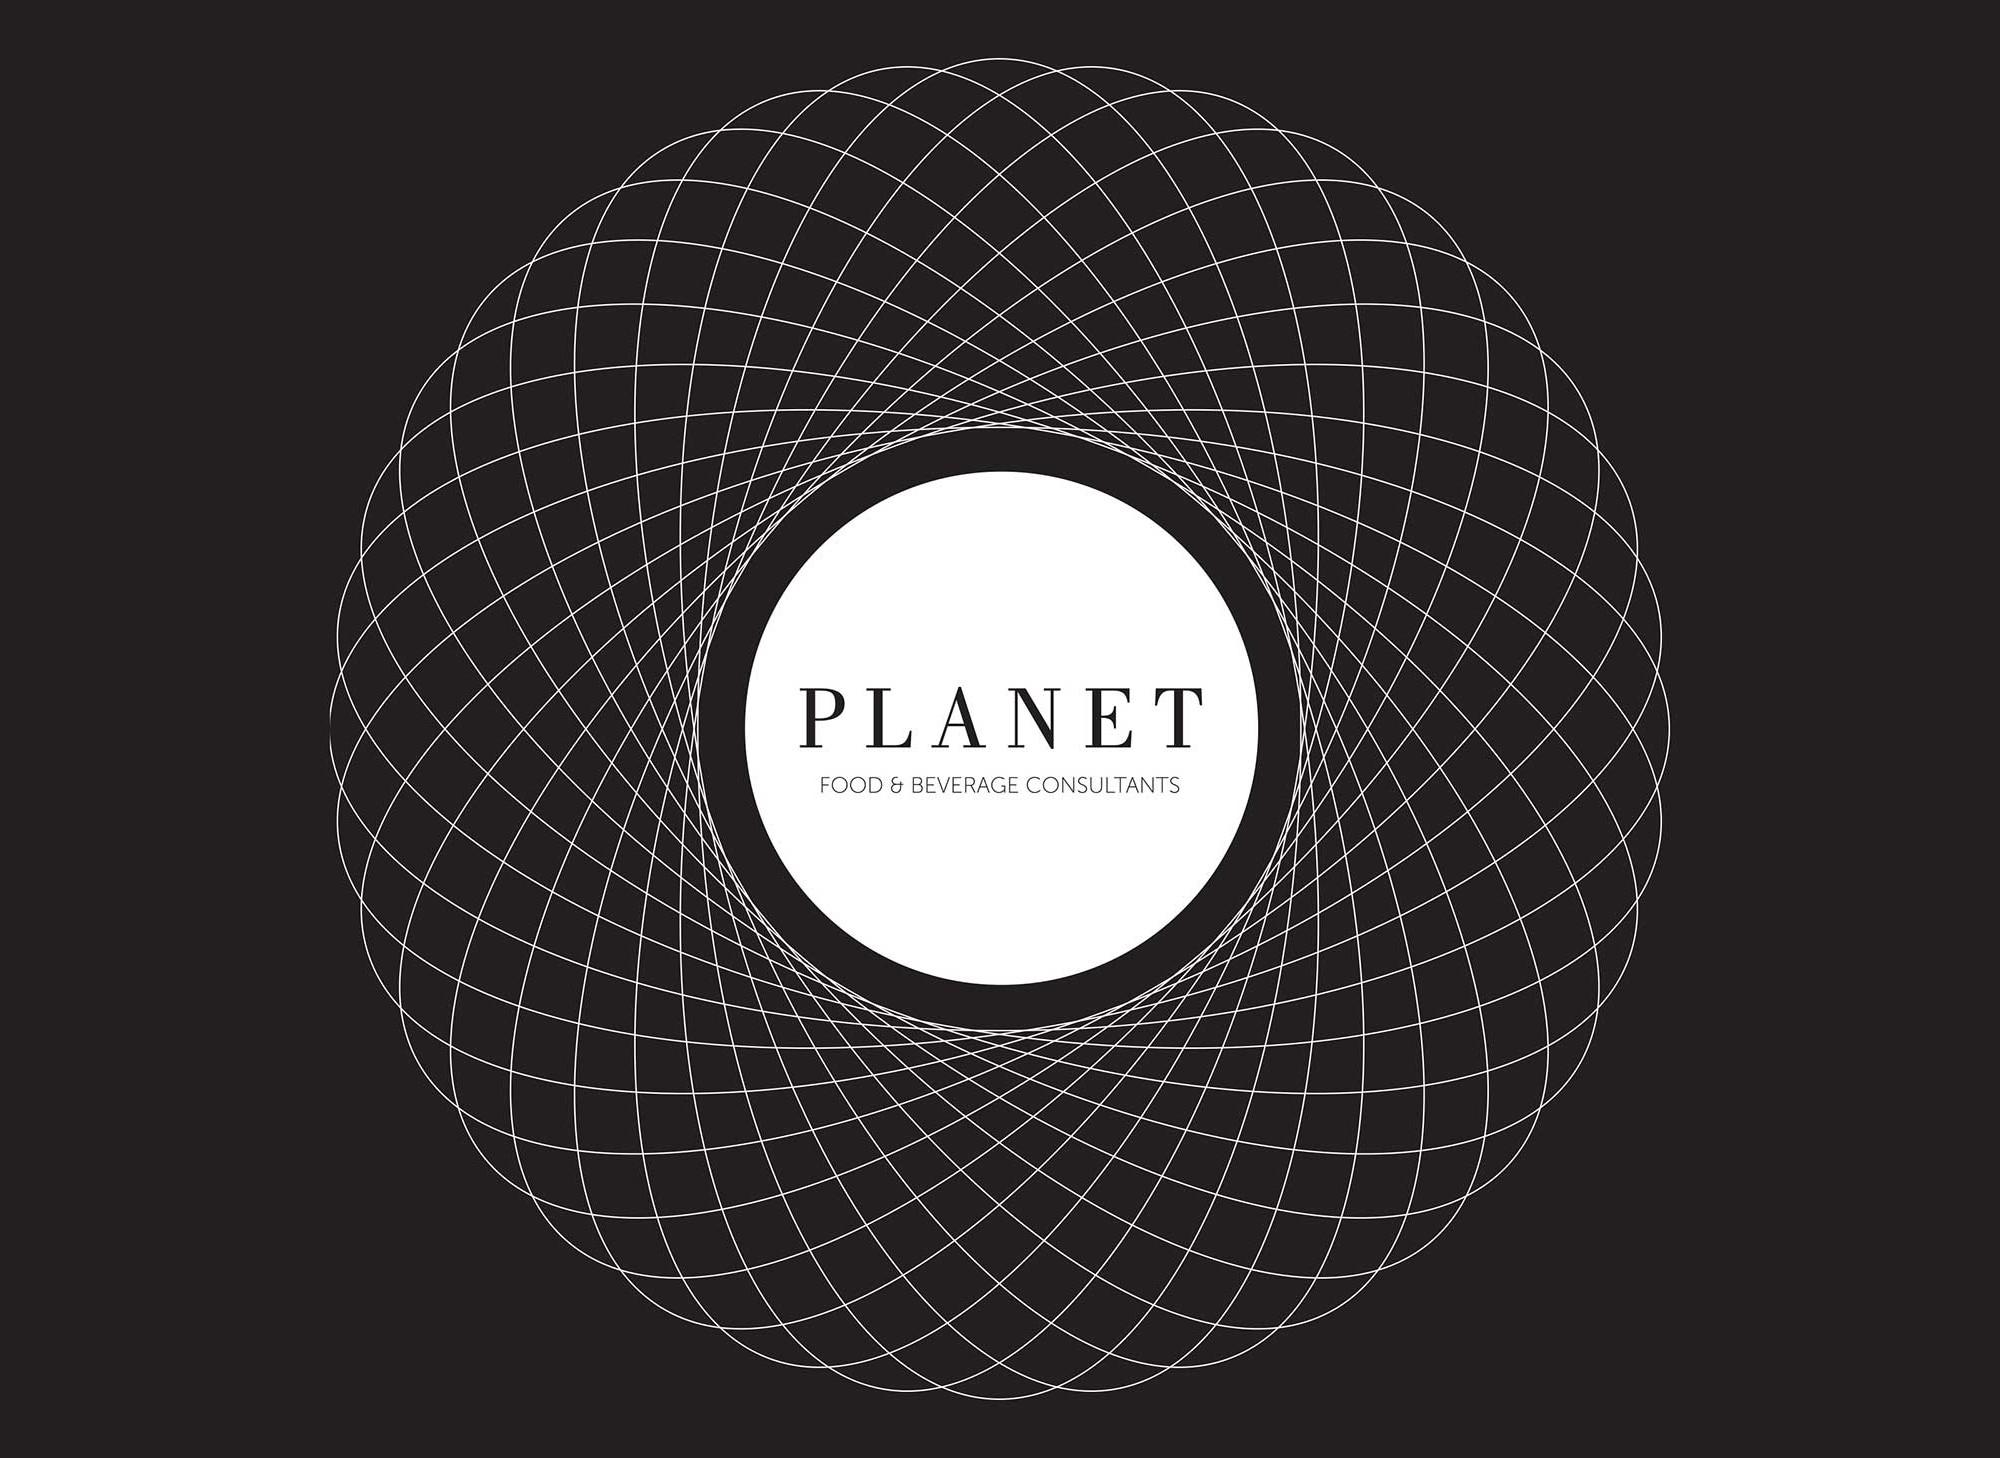 Planet Food Logo and Branding Design